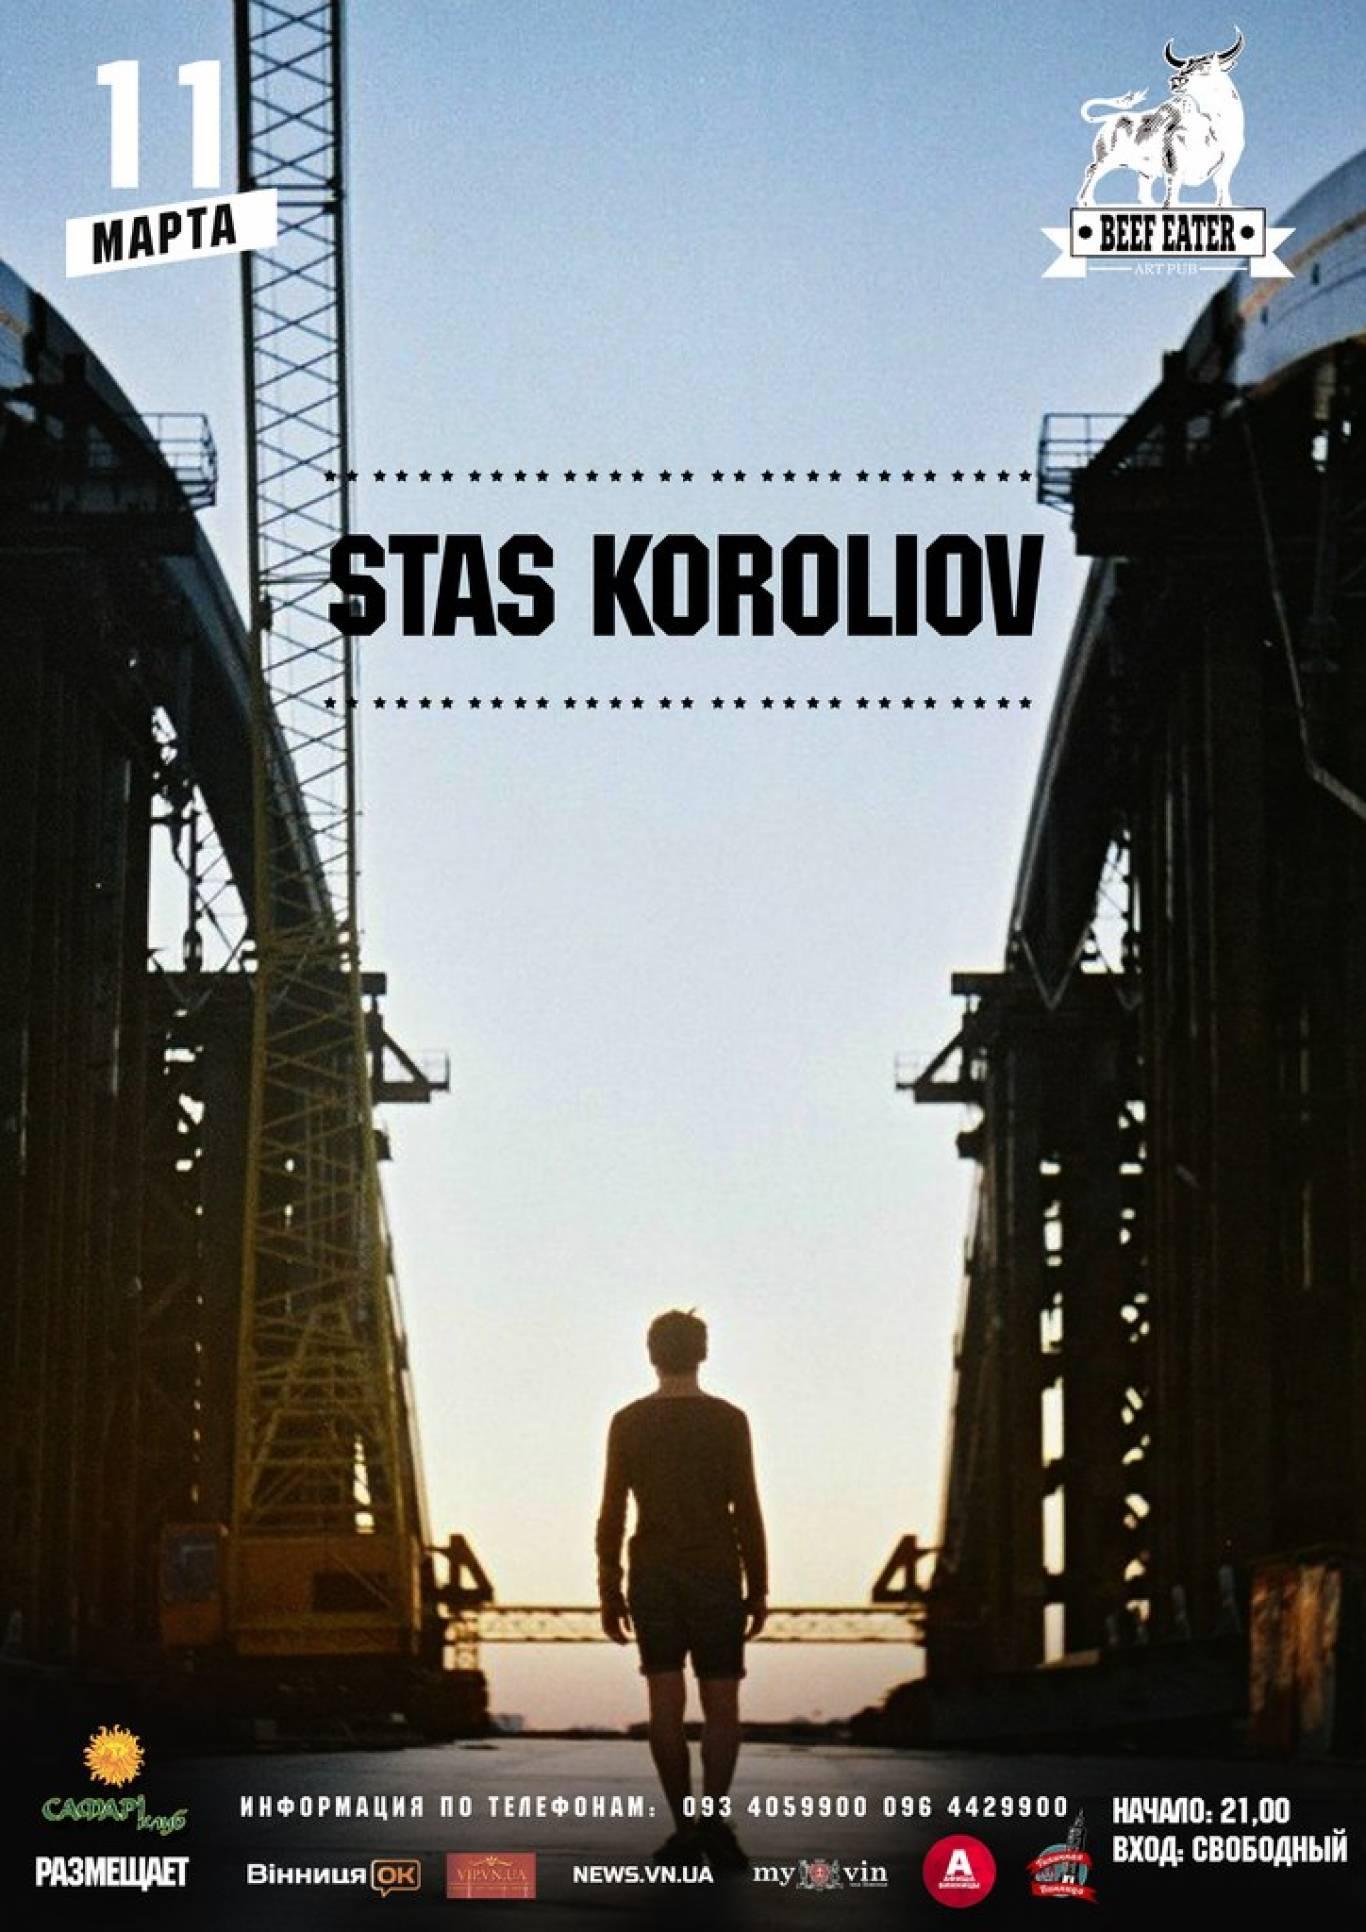 Акустичний концерт Stas Koroliov